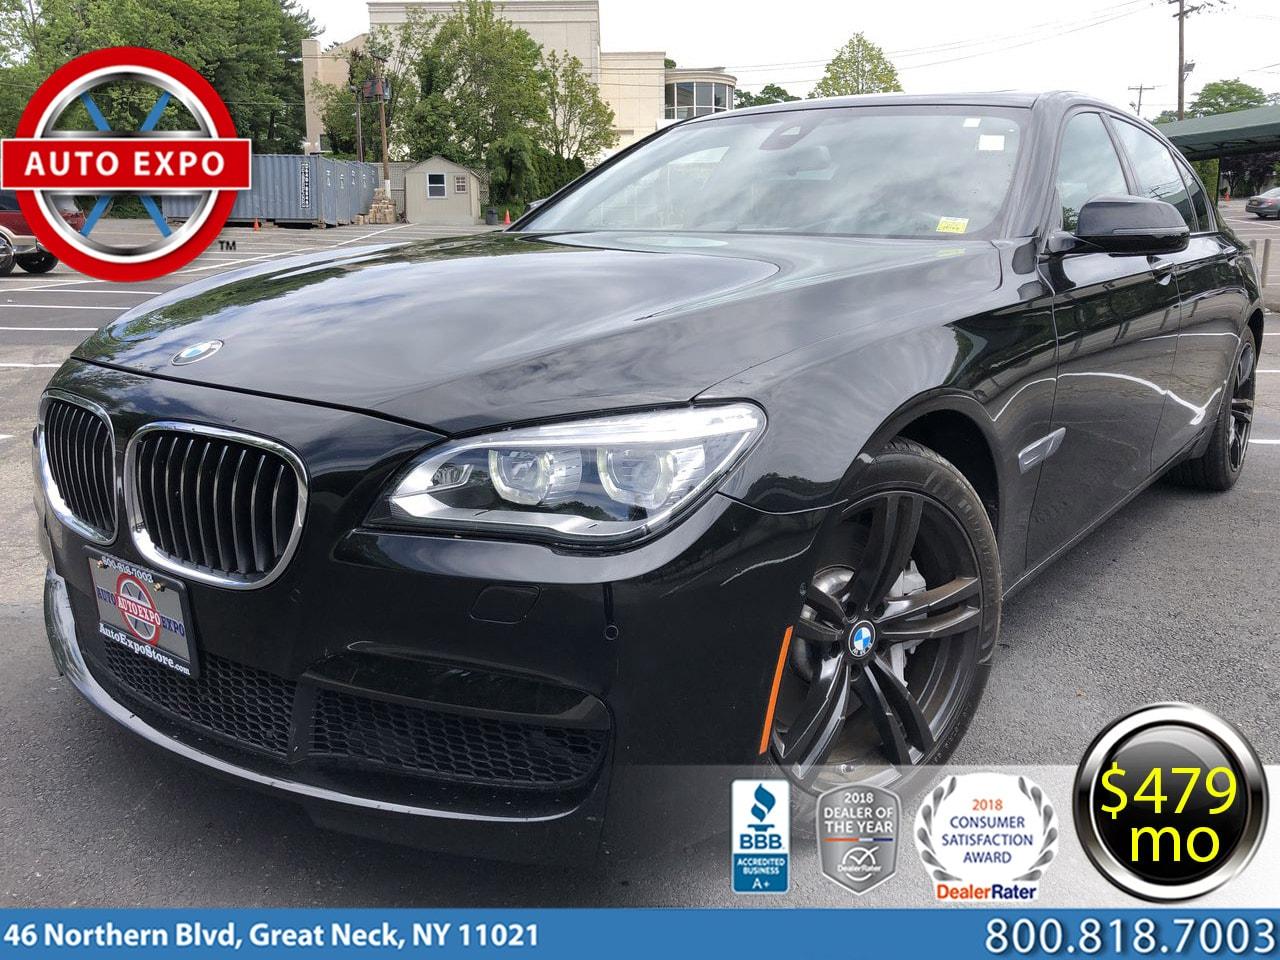 2015 BMW 7-Series 750LI M Sport Sedan